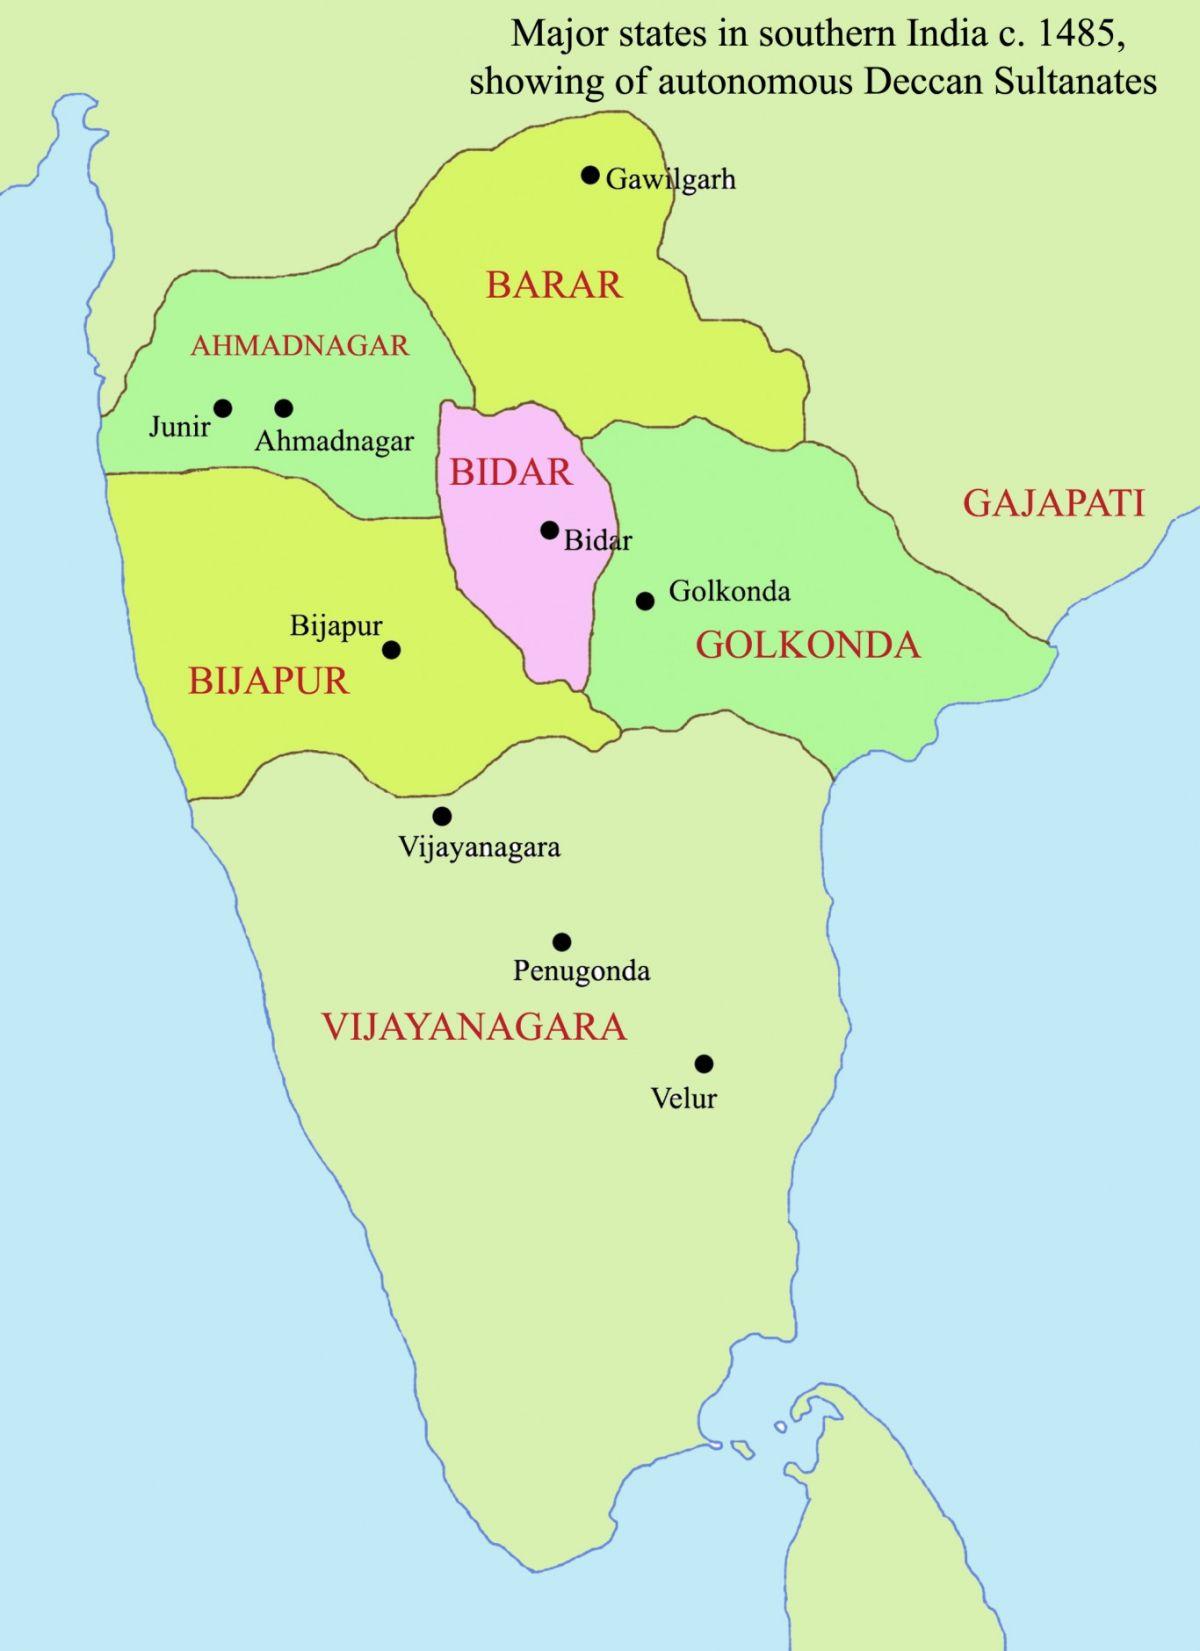 Deccan sultanates in 15th century